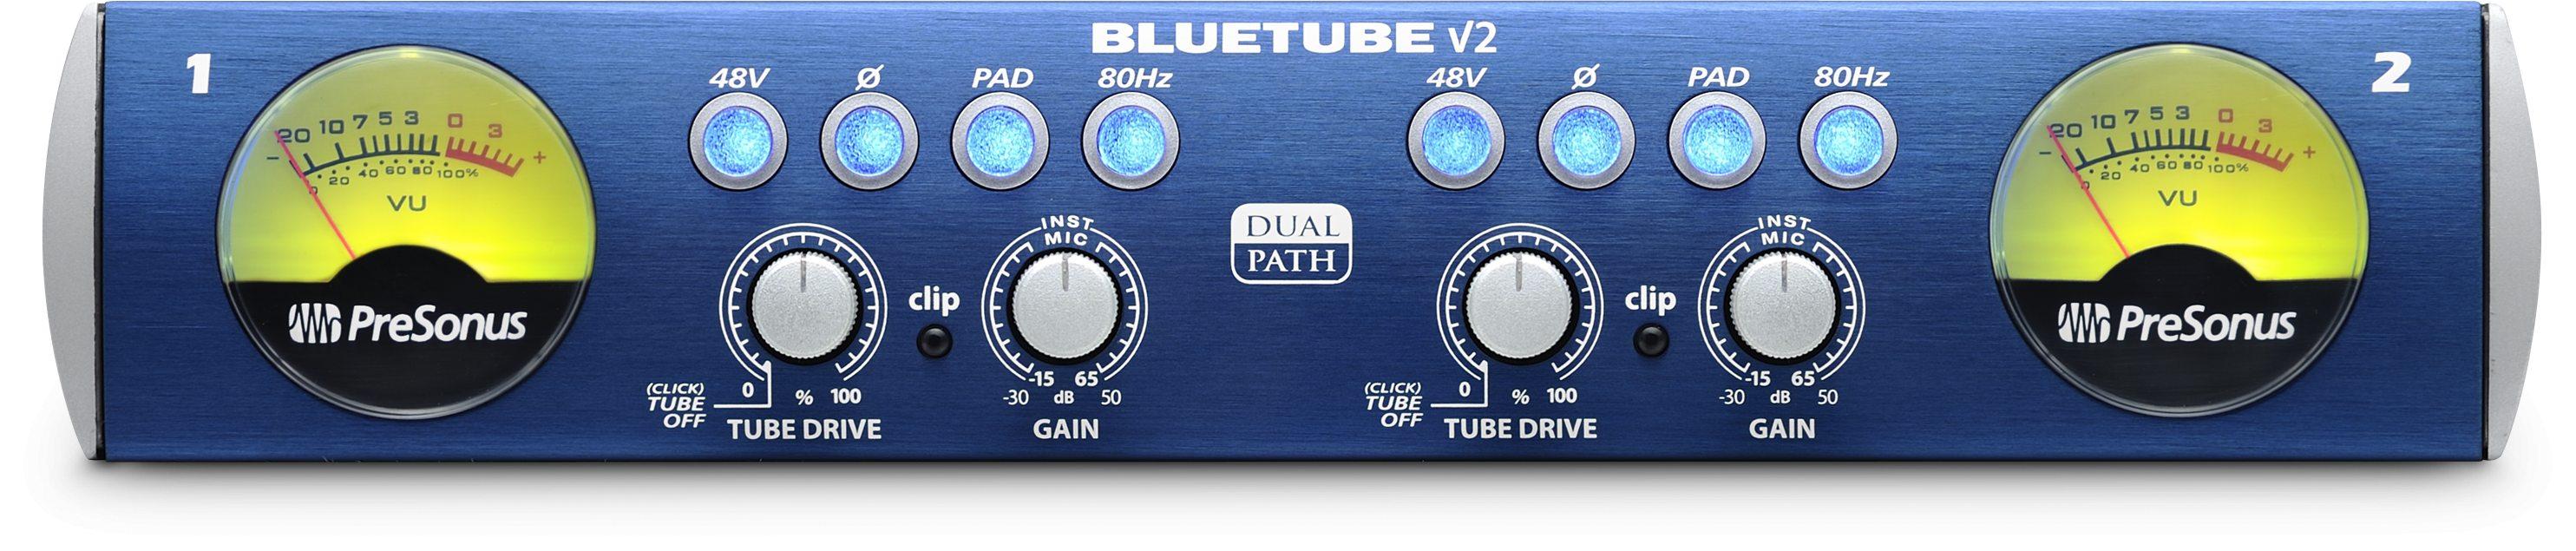 Presonus Blue Tube DP V2